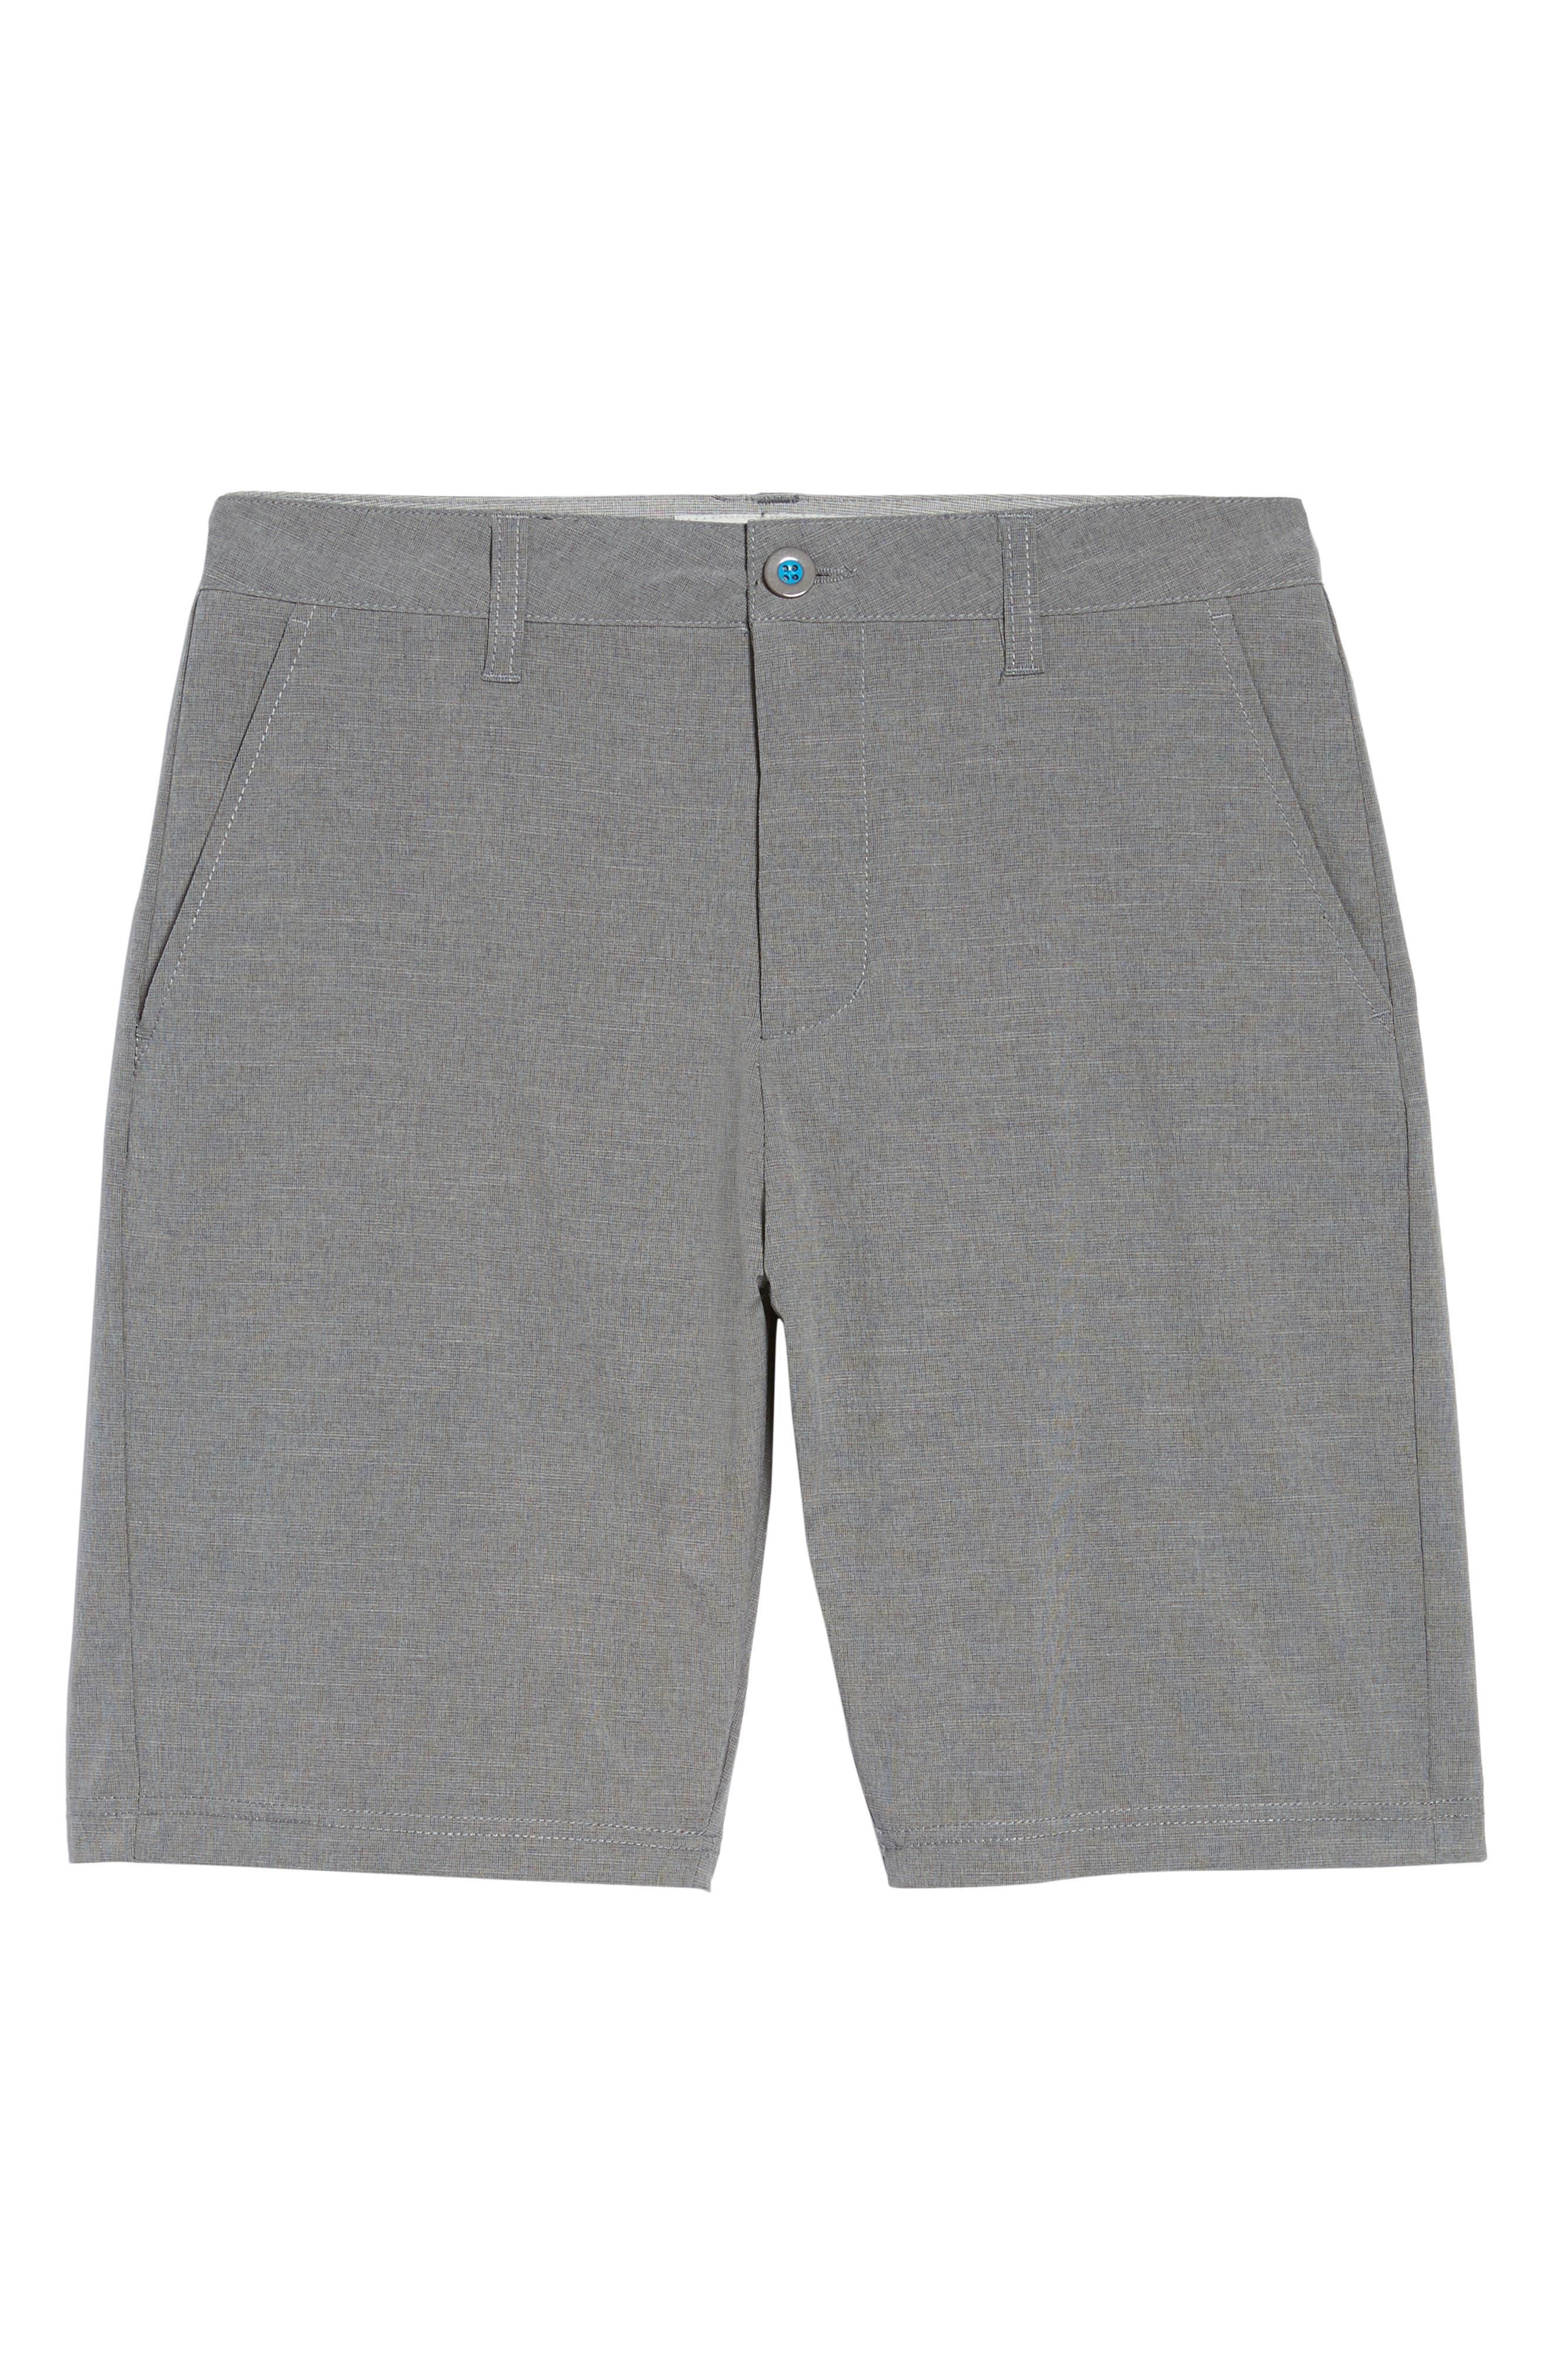 Cruiser Hybrid Shorts,                             Alternate thumbnail 6, color,                             CHARCOAL